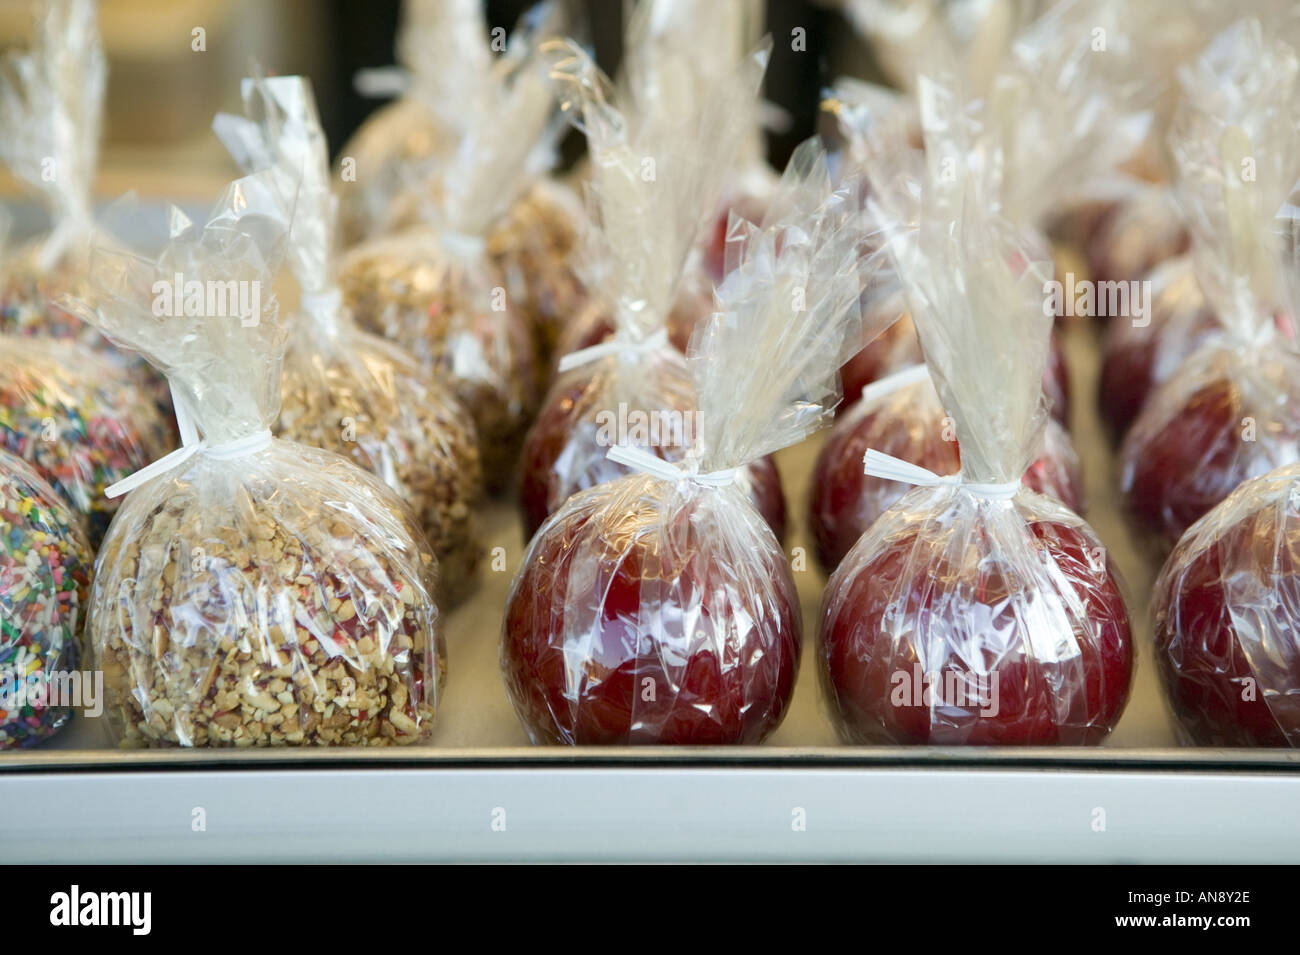 New york montgomery county fonda - Candy Apples Wrapped And Ready Fonda Fair Montgomery County New York